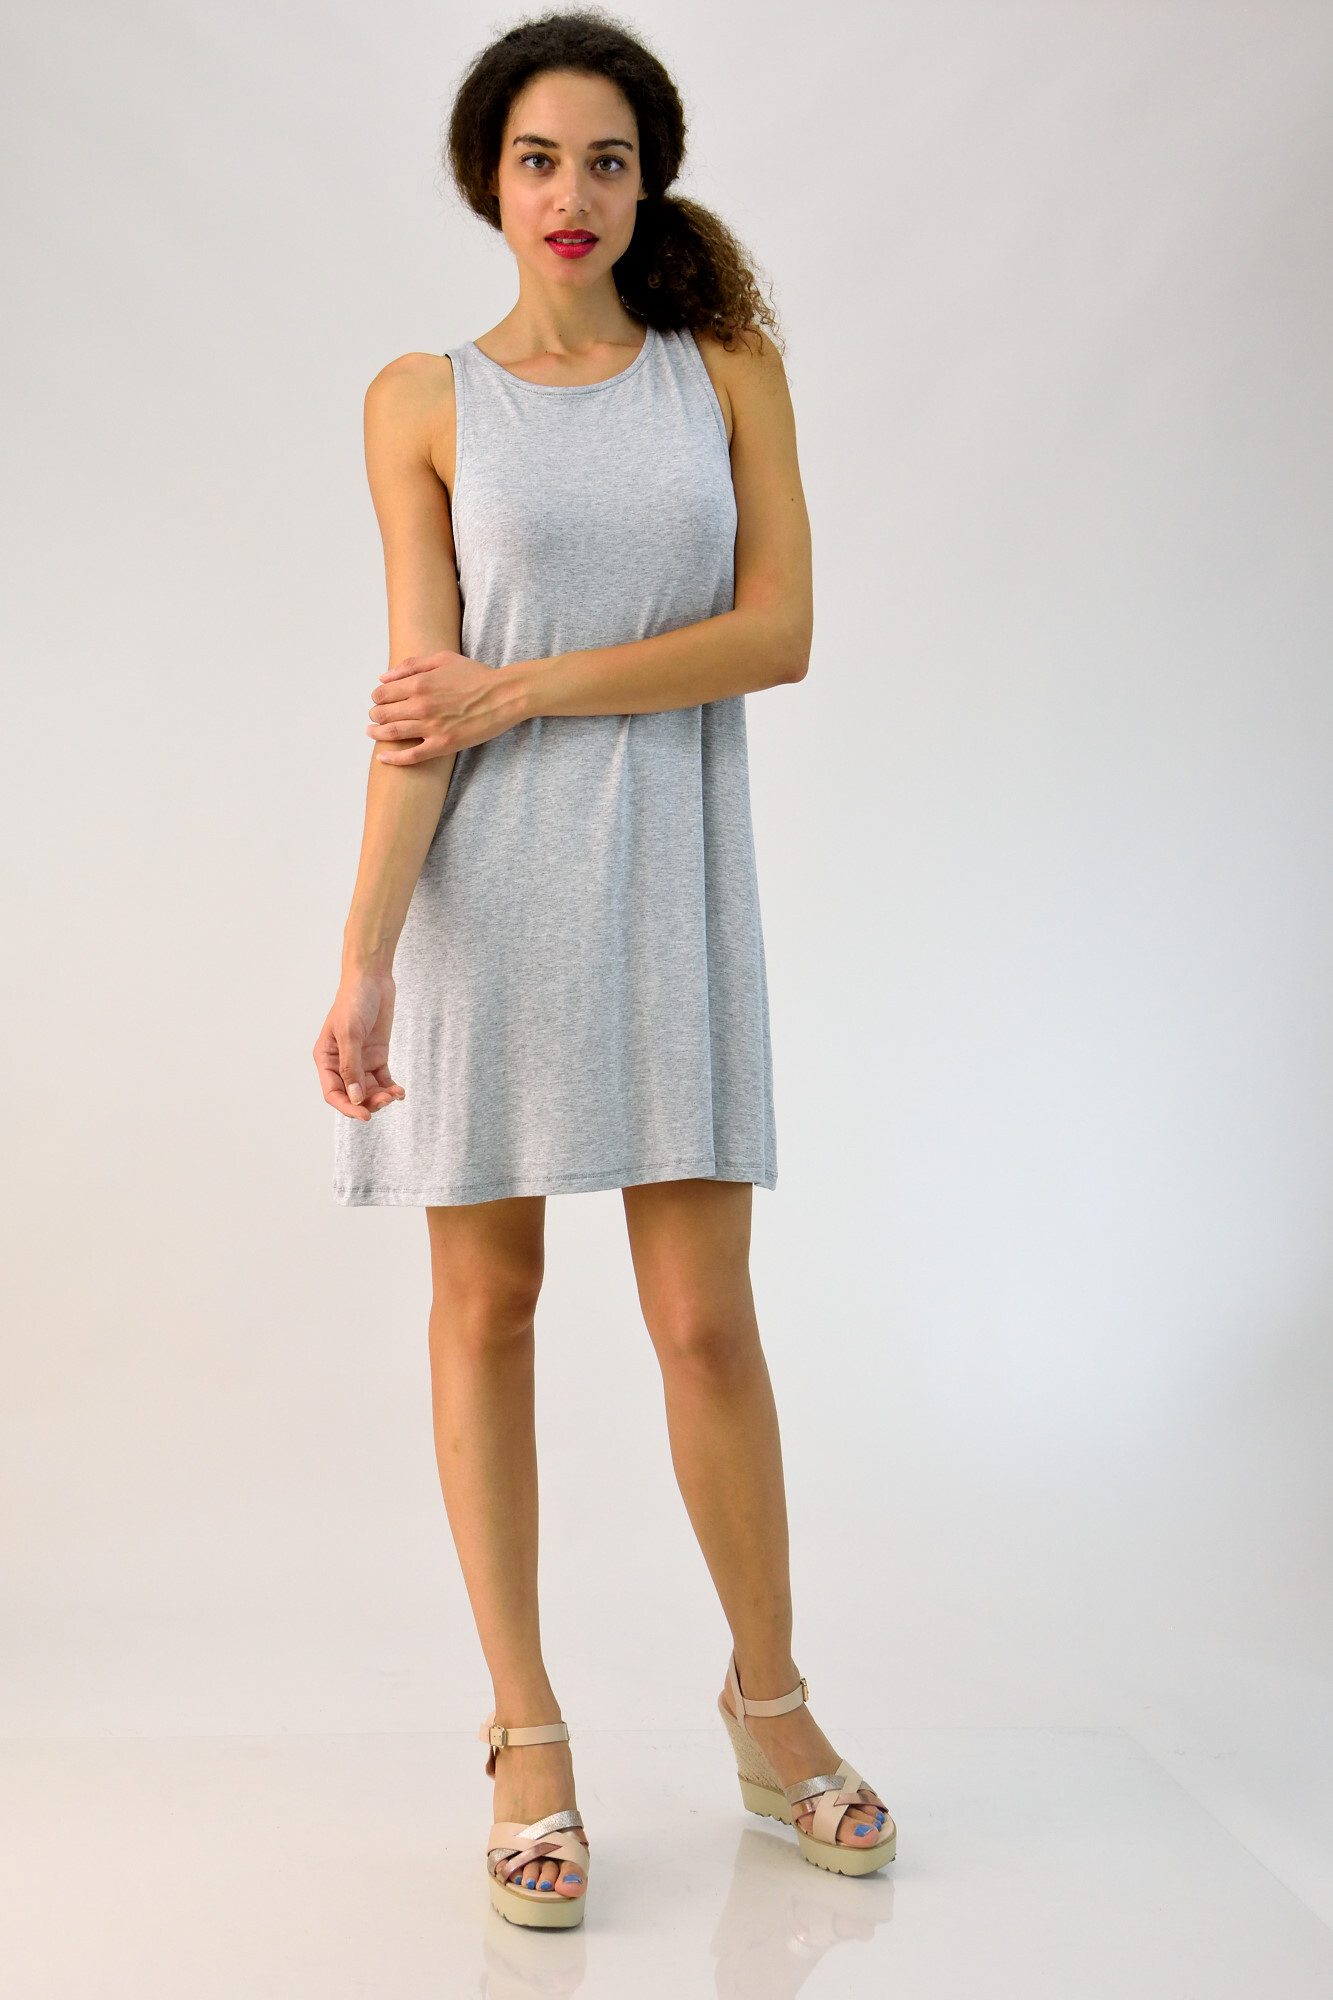 54552e93332 Φόρεμα αμάνικο με άνοιγμα τύπου